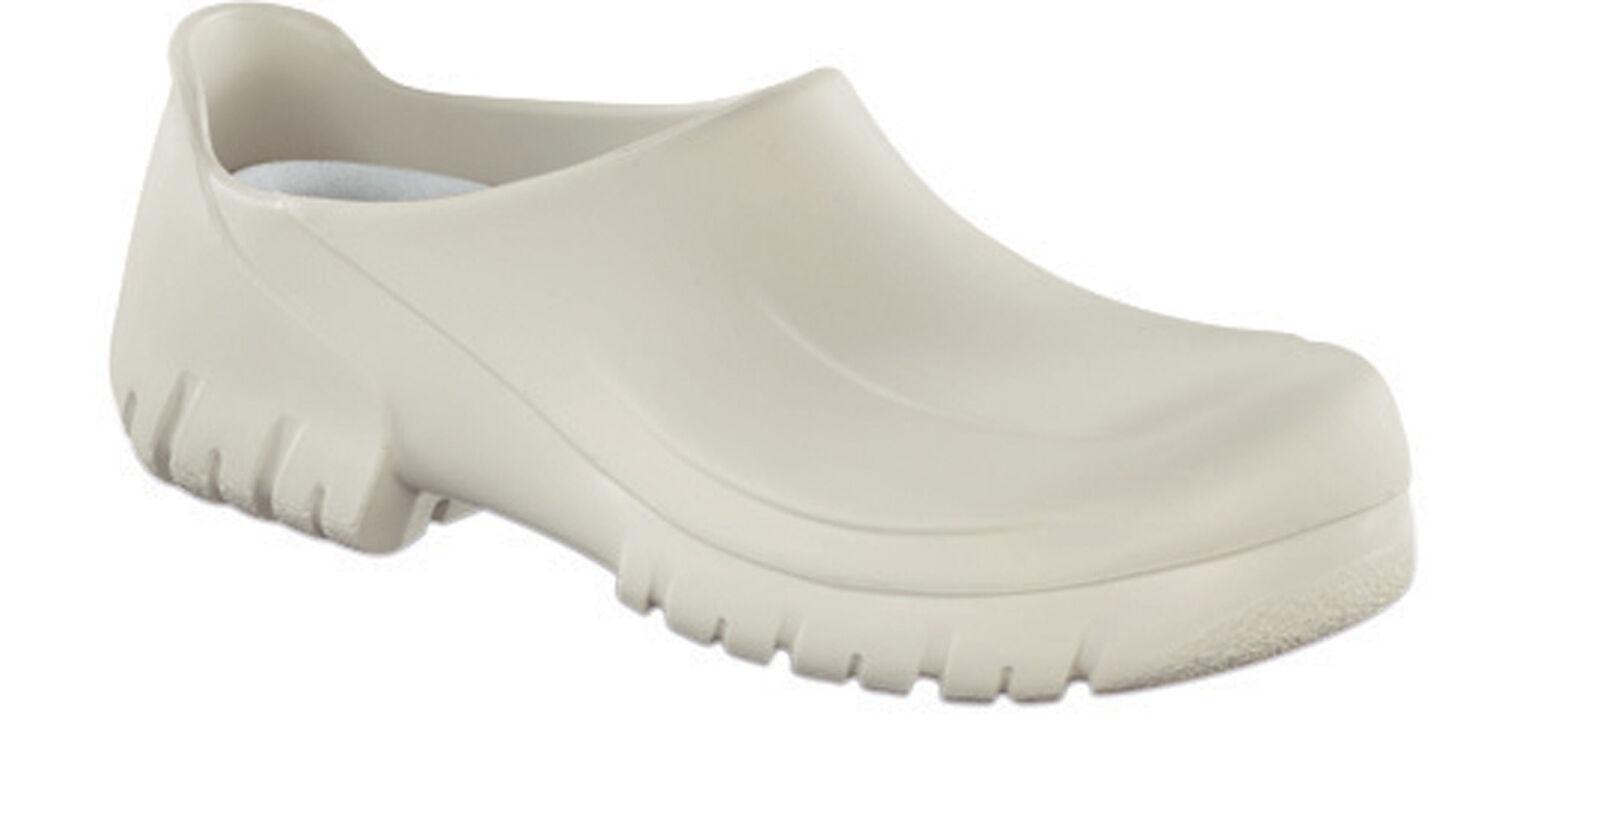 Birkenstock A 640 PU steel cap Unisex Clogs Schuhes Sandales Slippers